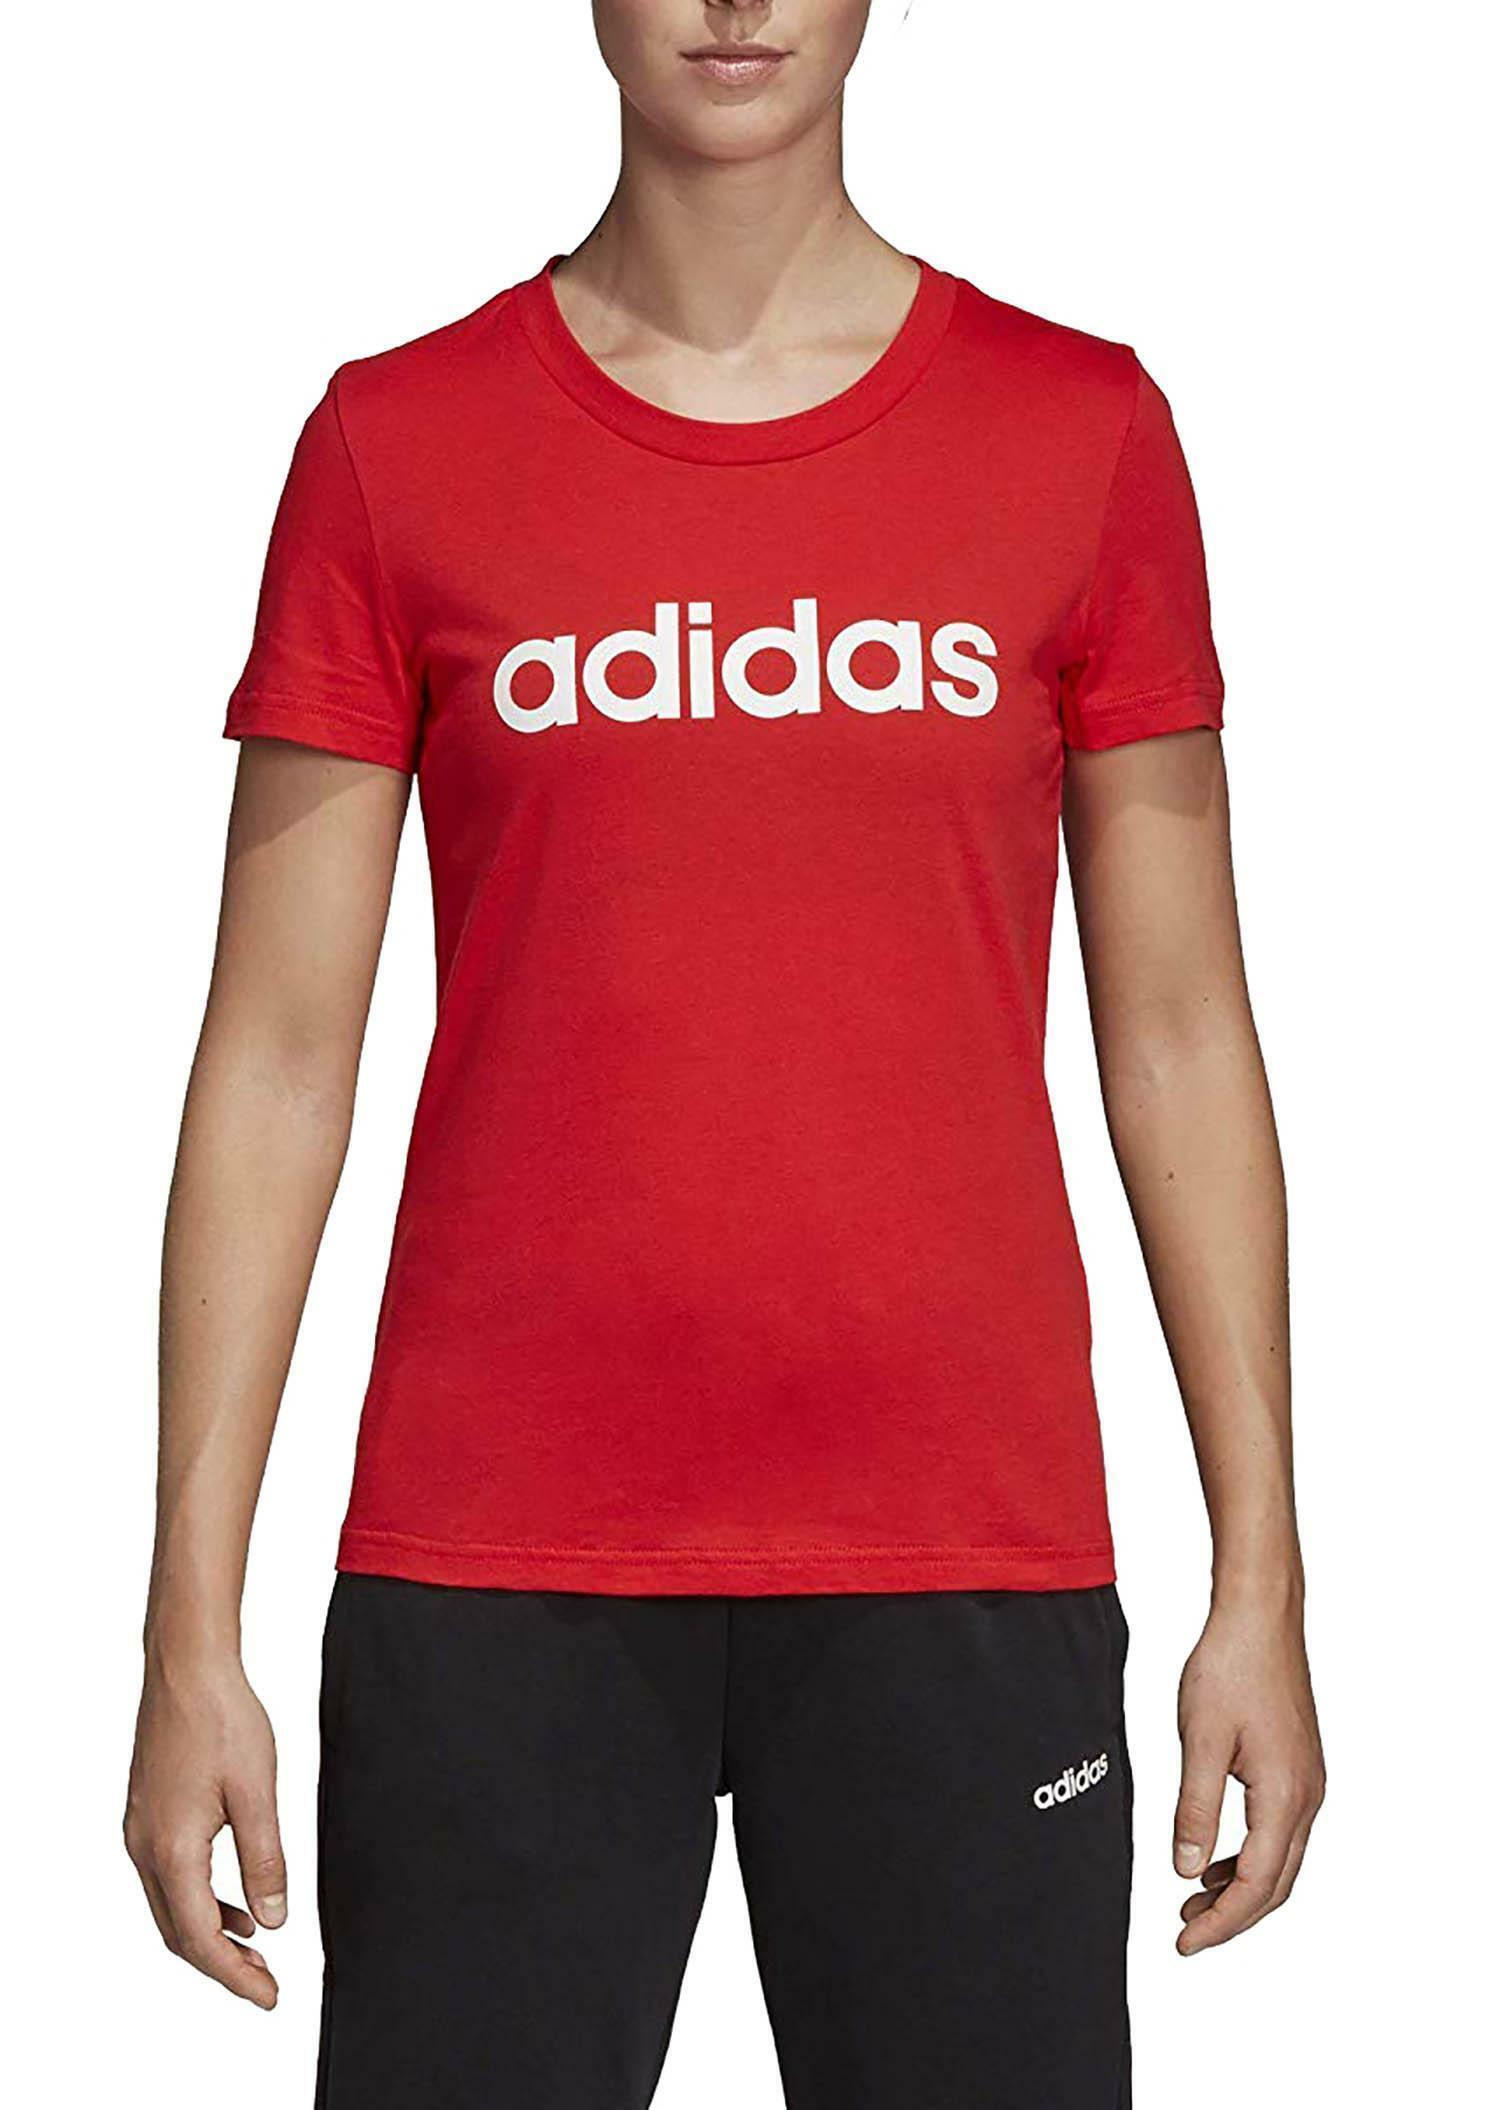 t shirt adidas femme rouge